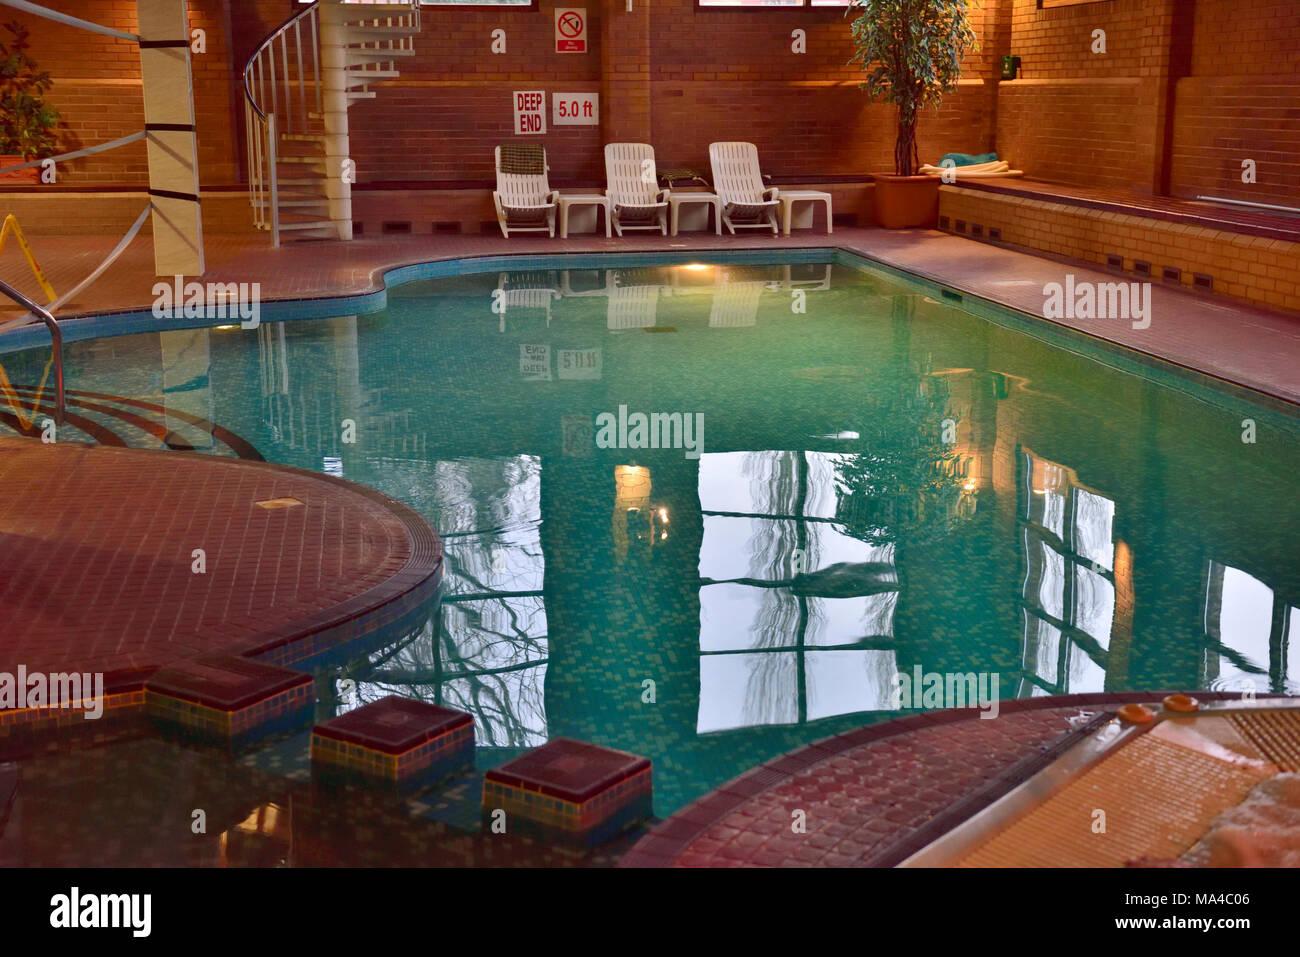 Swimming pool uk stock photos swimming pool uk stock images alamy for Chlorine free swimming pool london